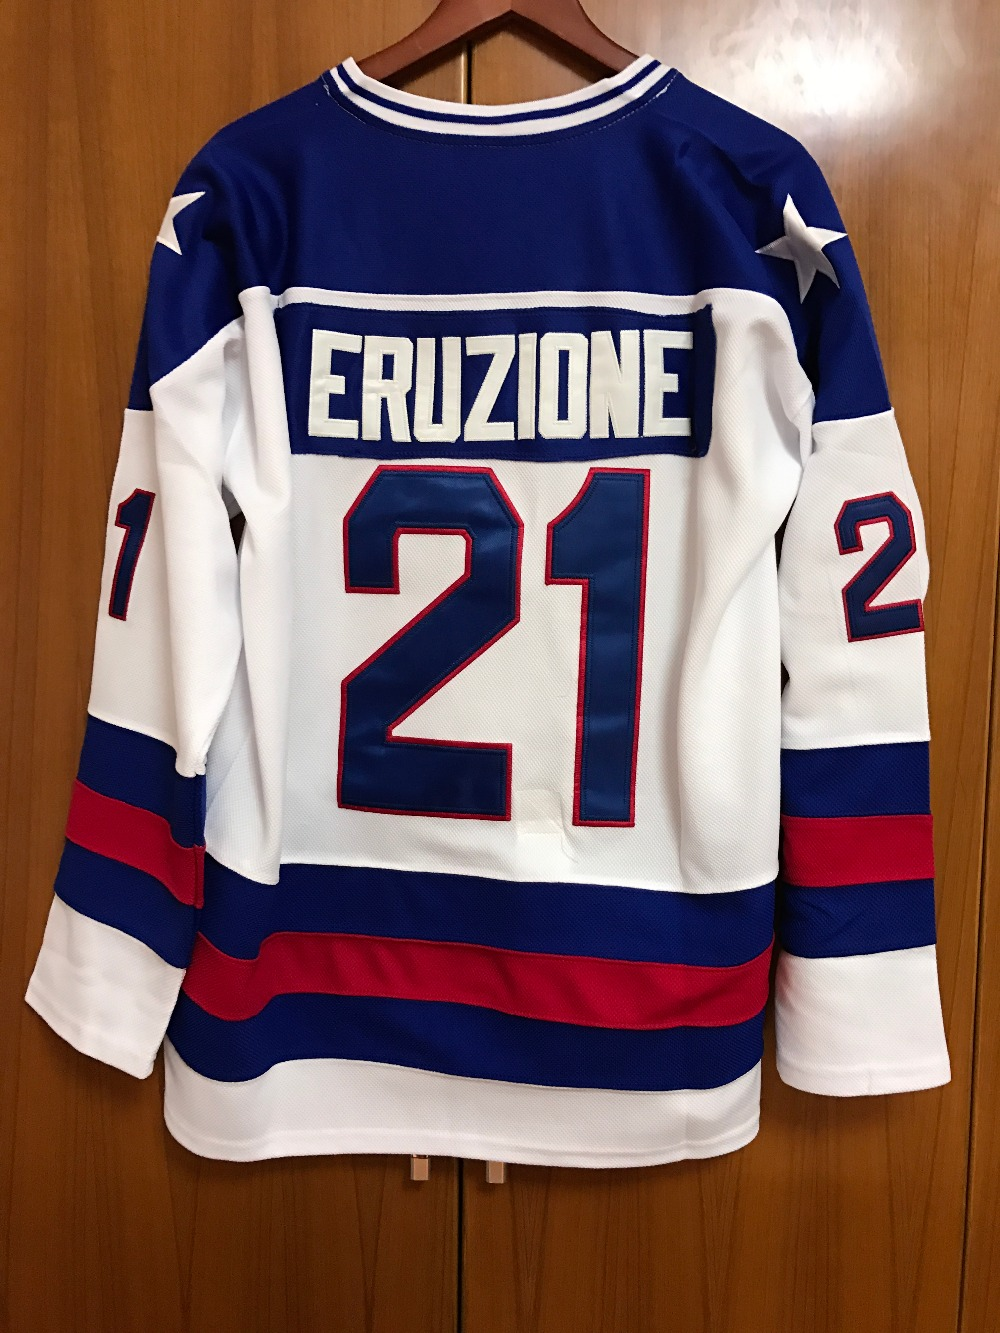 1980 Miracle On Ice Team USA Mike Eruzione 21 Hockey Jersey White All stitched(China (Mainland))